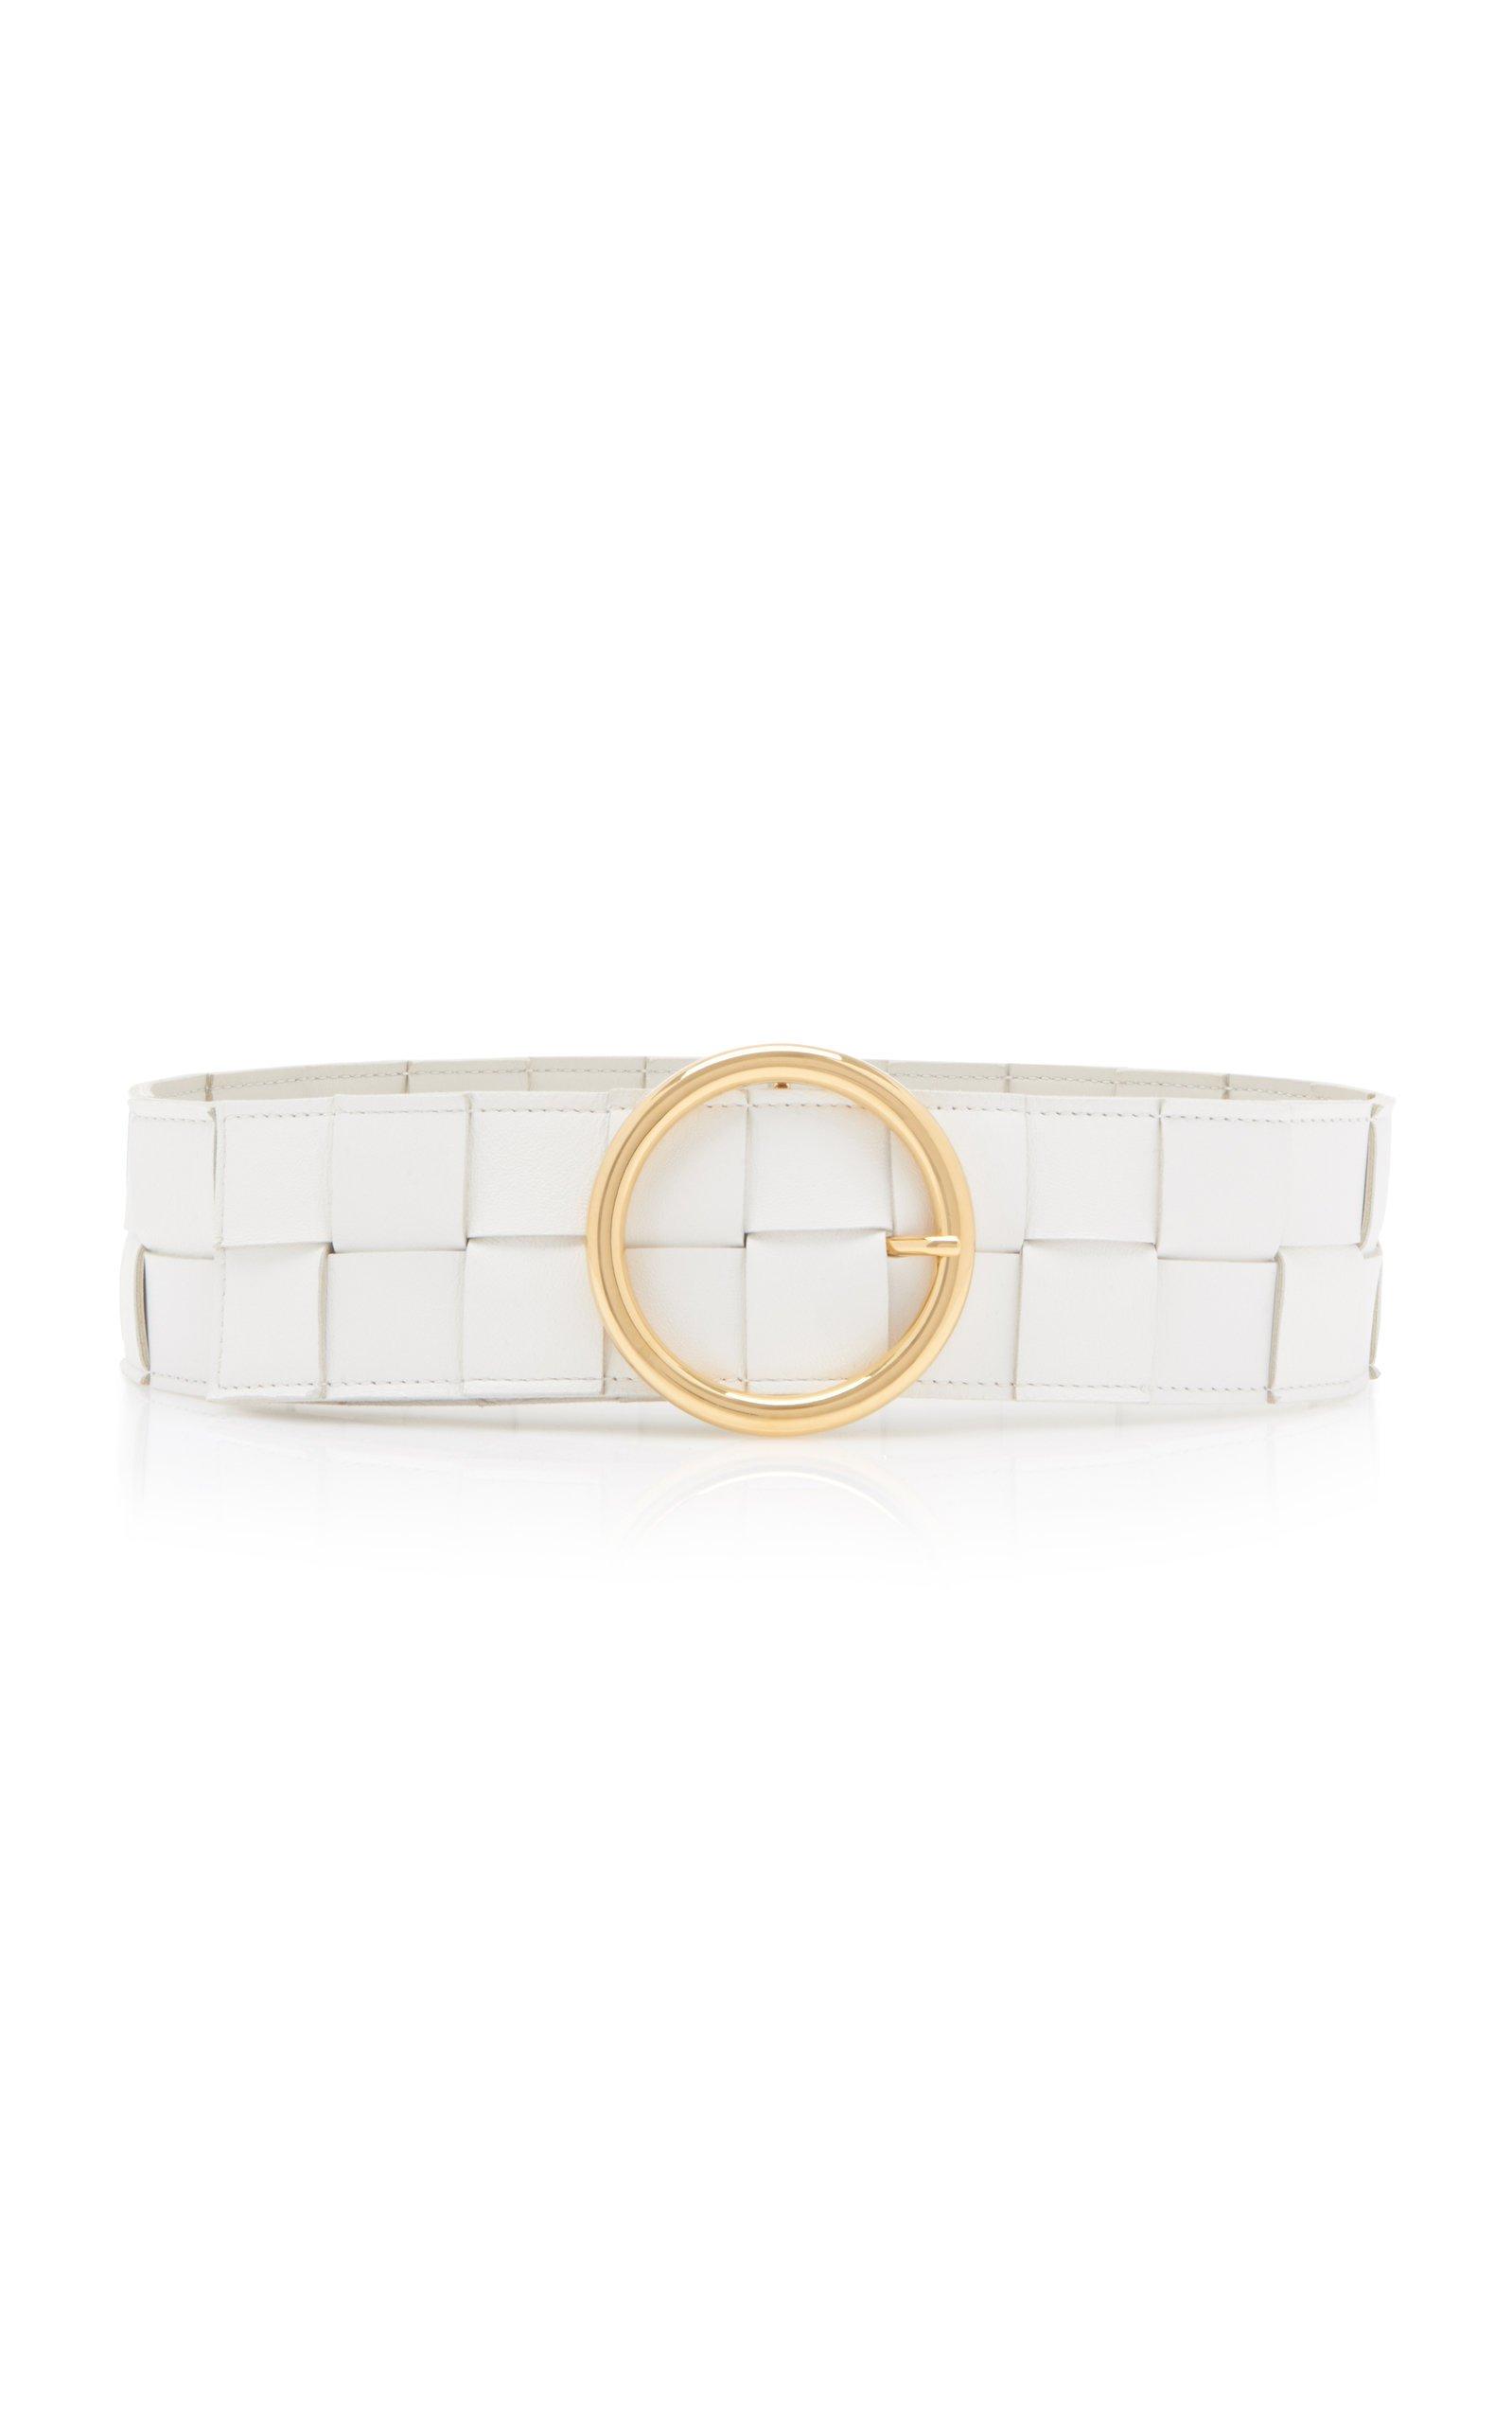 Bottega Veneta Intrecciato Leather Belt Size: 85 cm